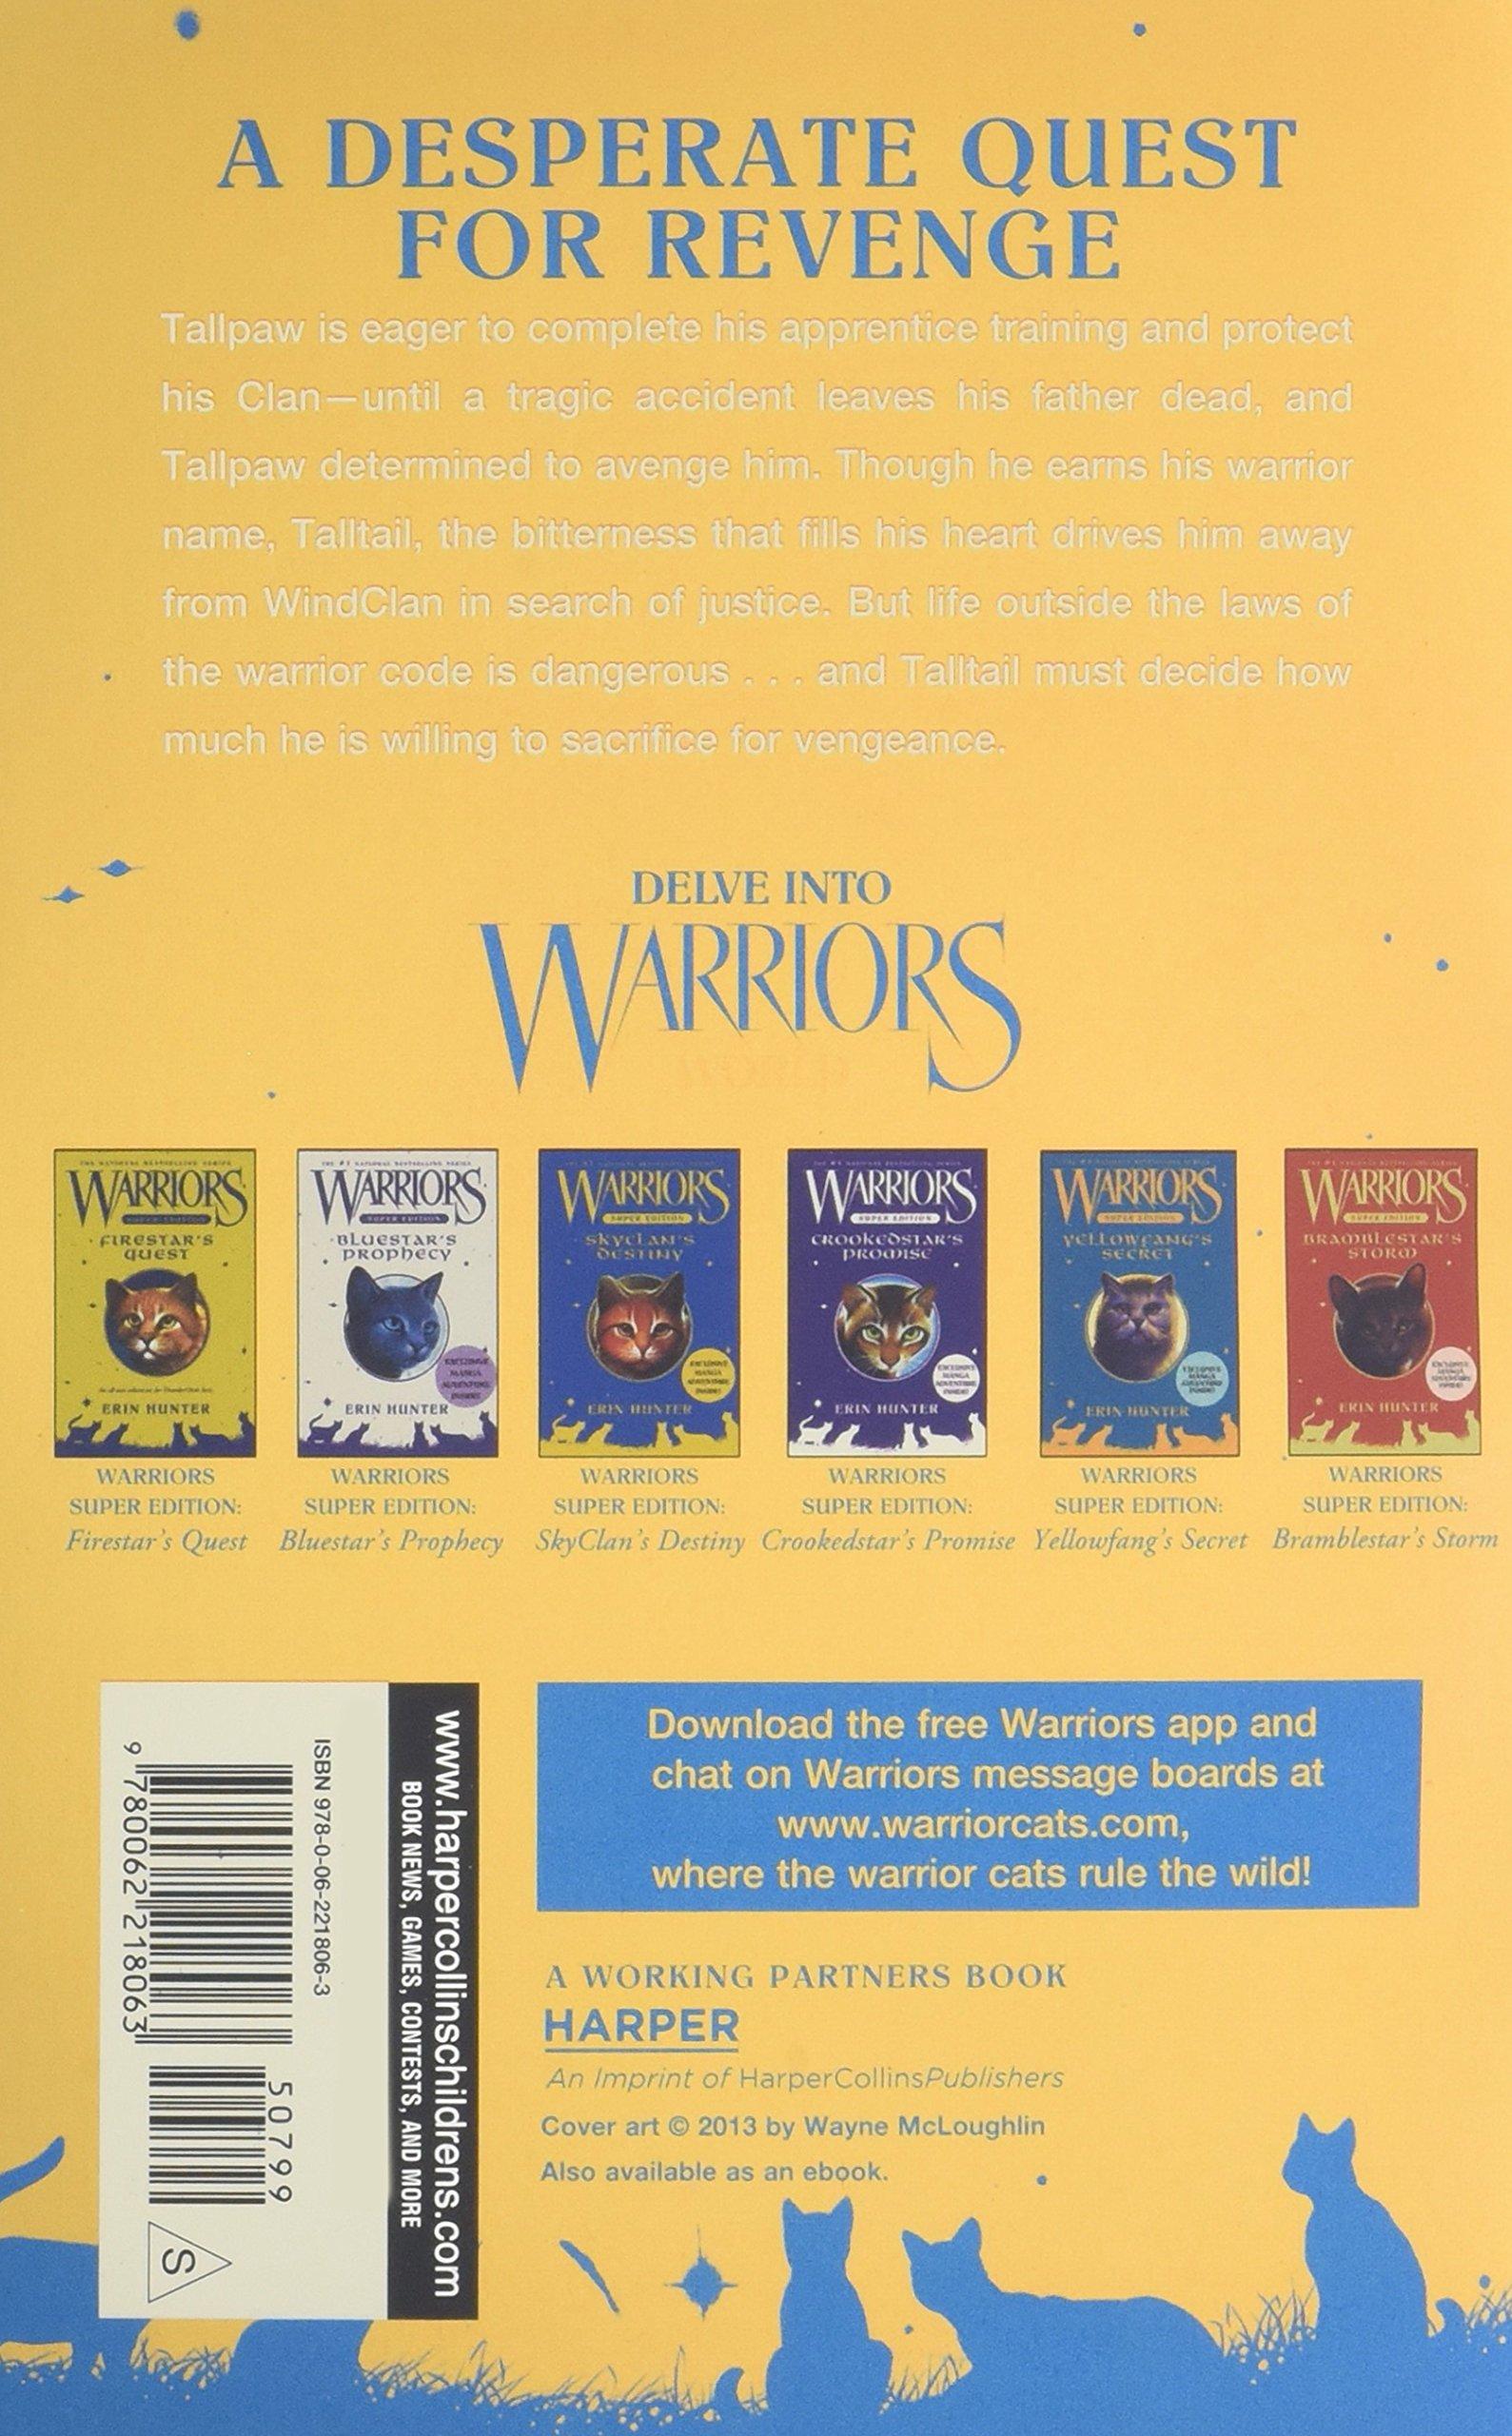 Warriors Super Edition: Tallstar's Revenge: Erin Hunter, James L Barry:  9780062218063: Amazon: Books